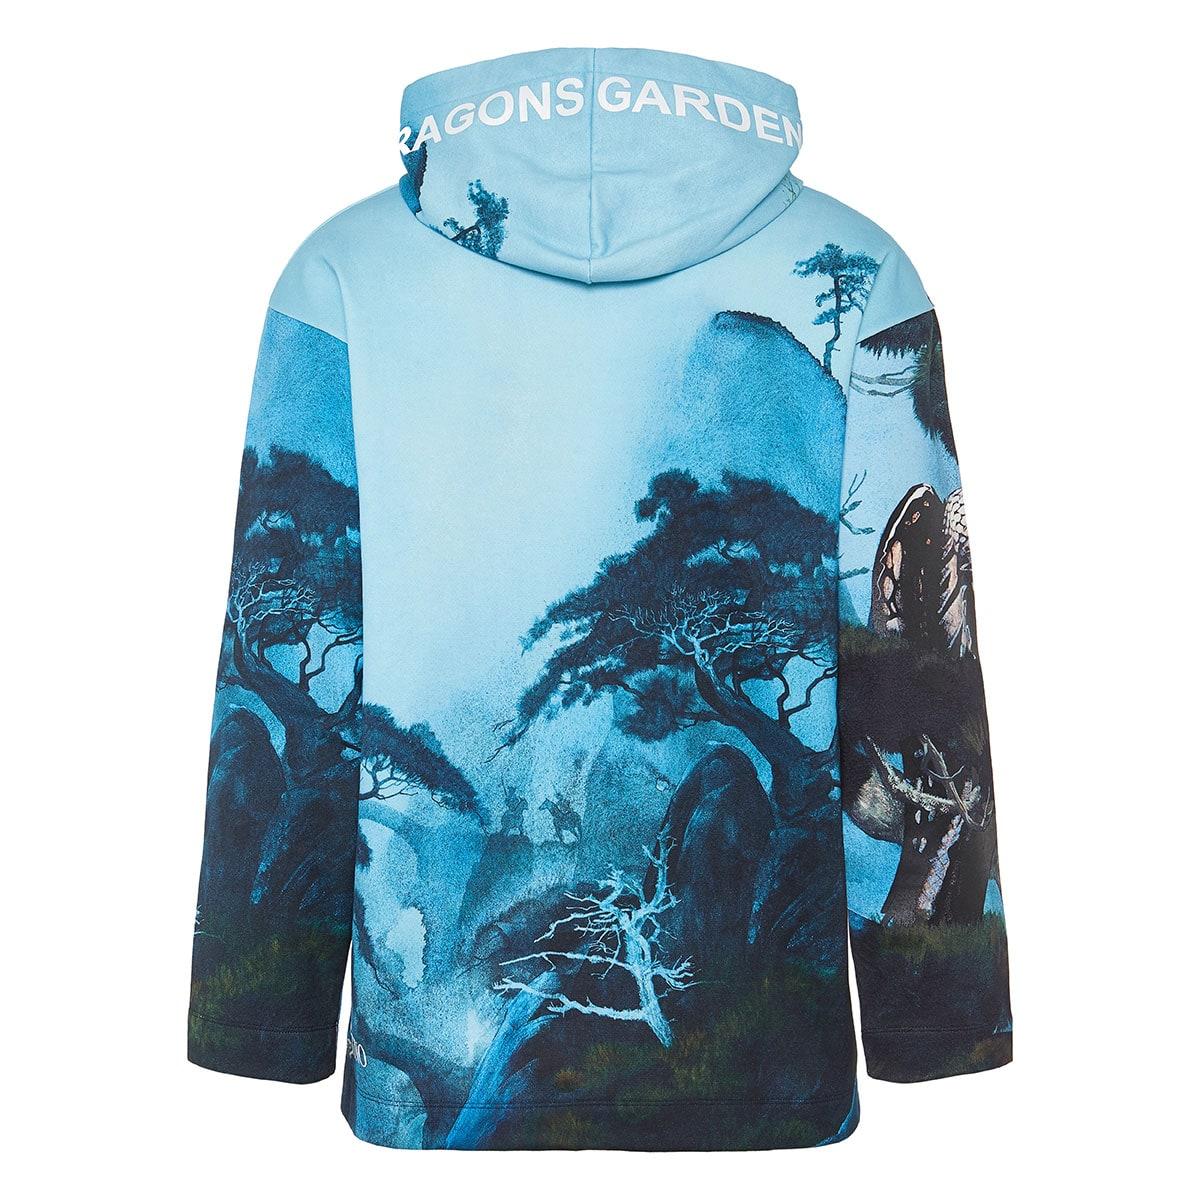 Dragons Garden oversized printed hoodie